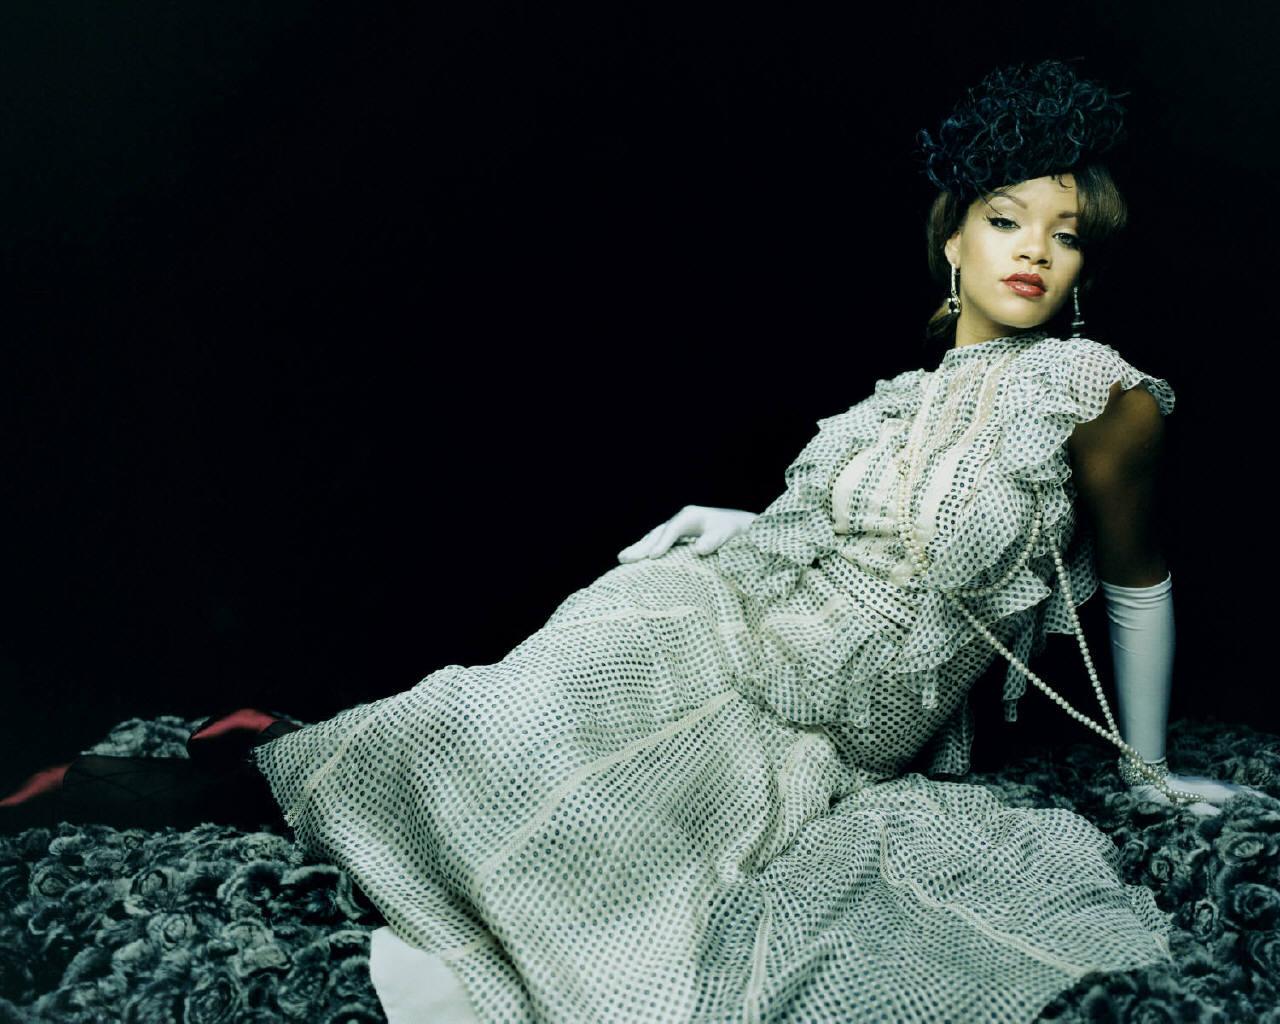 http://images.fanpop.com/images/image_uploads/Rihanna-rihanna-166368_1280_1024.jpg